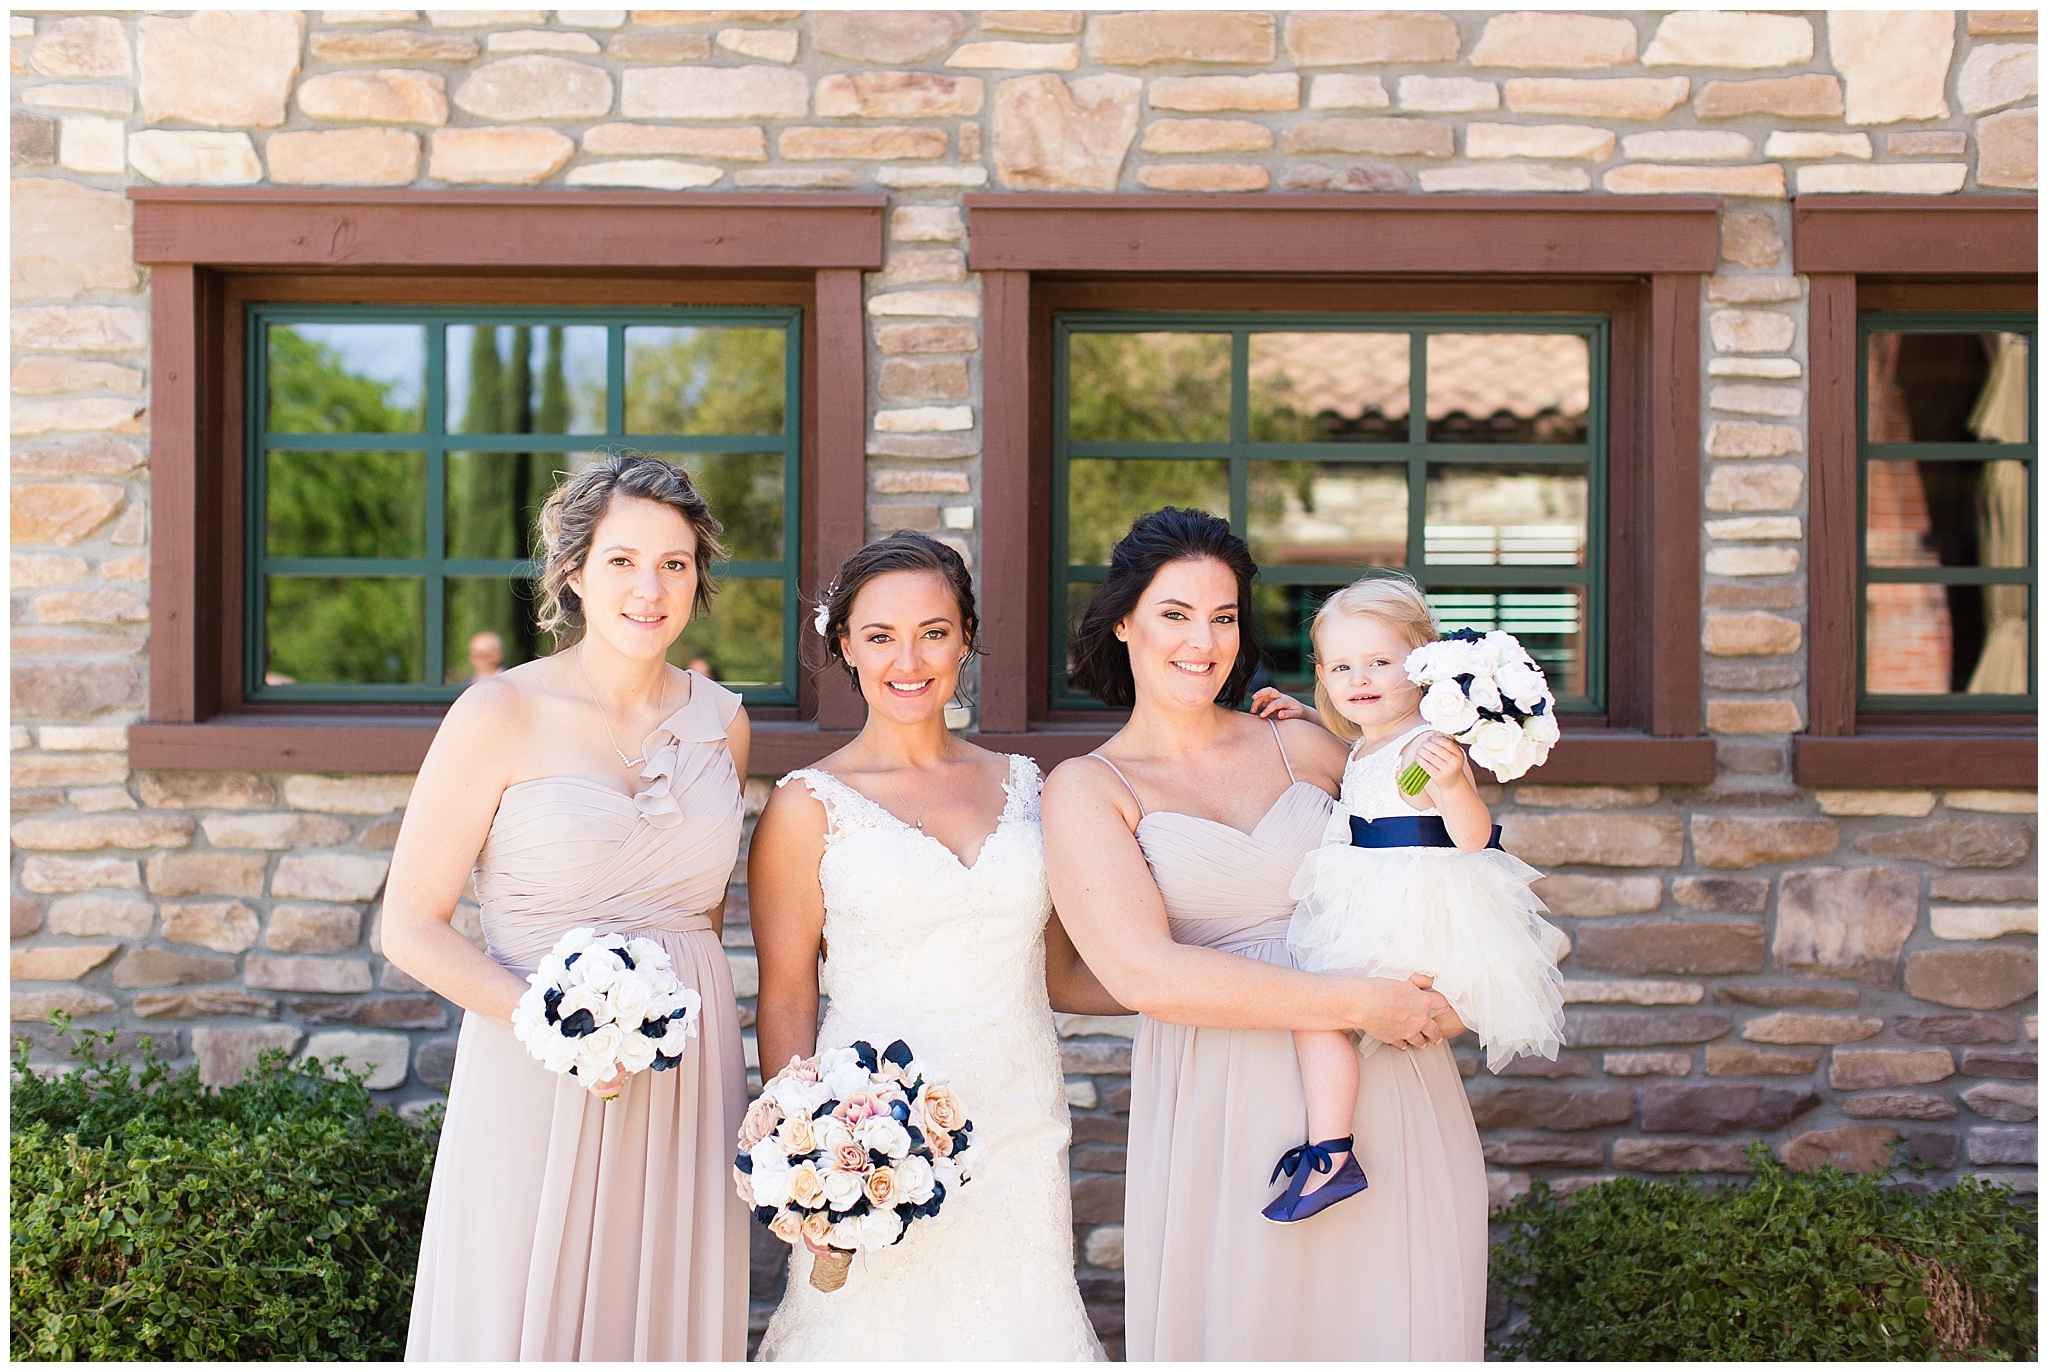 Vinny-Cayt-Wedding-04-26-18-1066.jpg